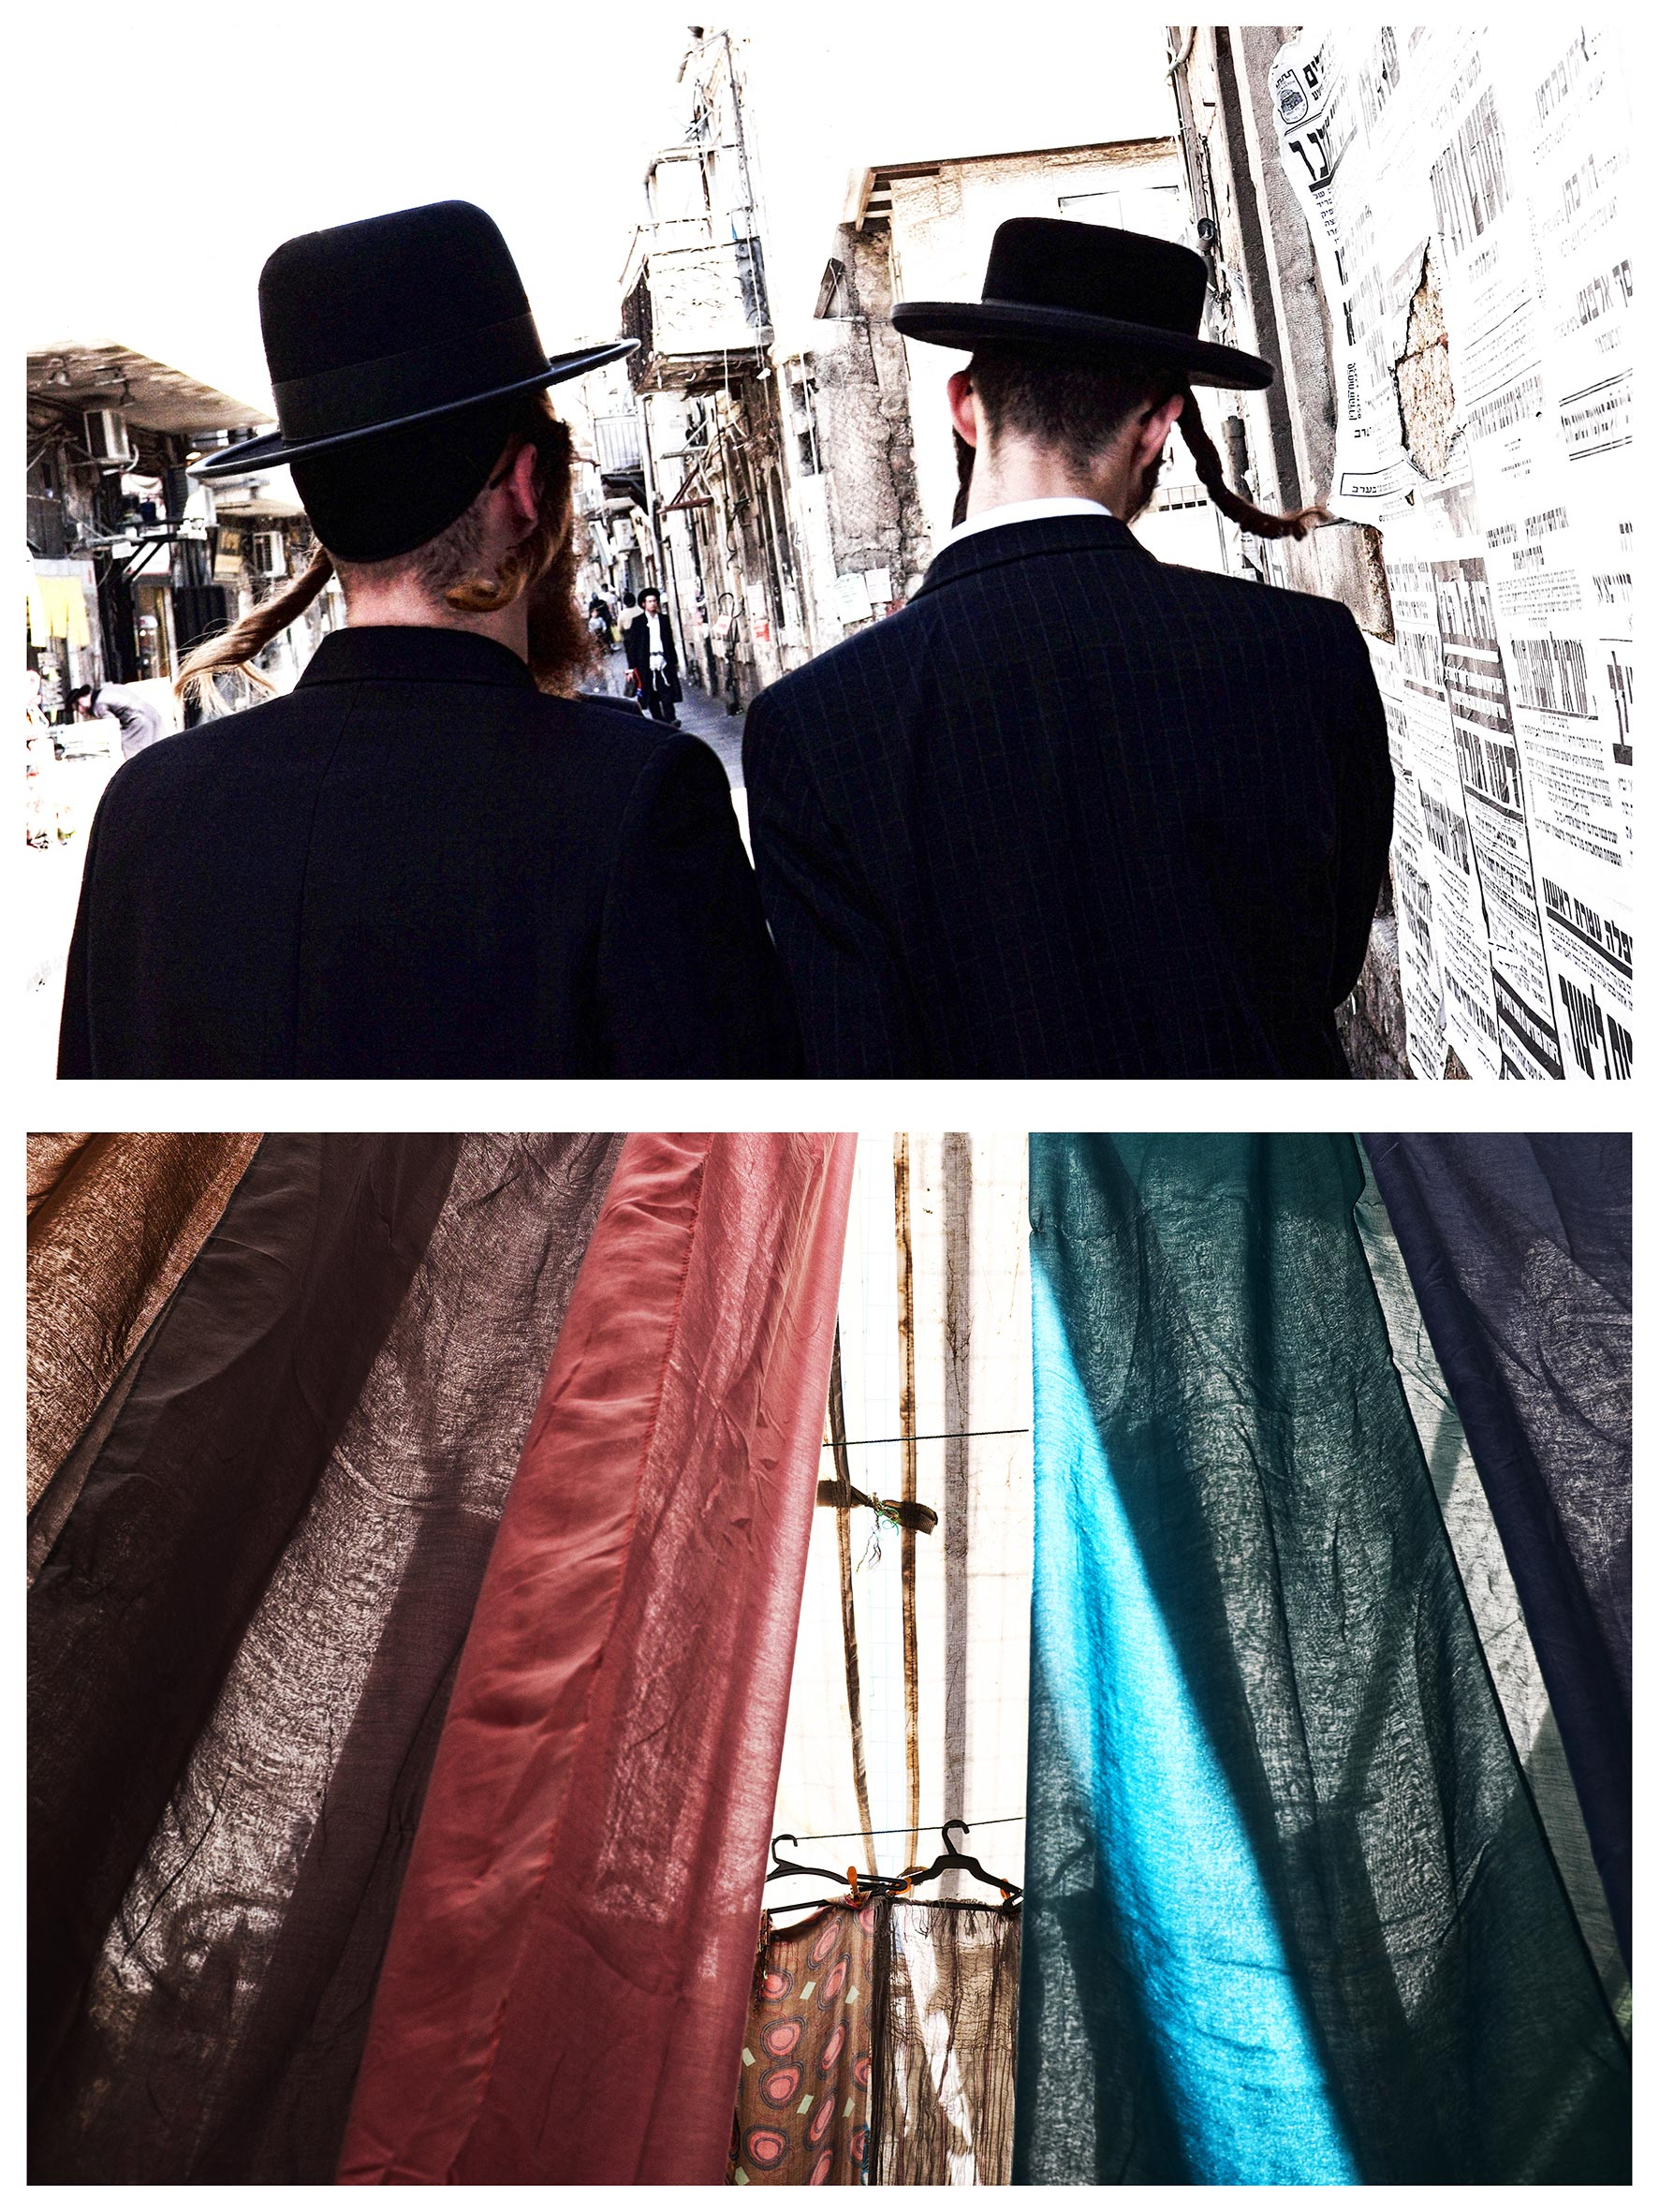 #au milieu un mur 3. Jérusalem / Hébron